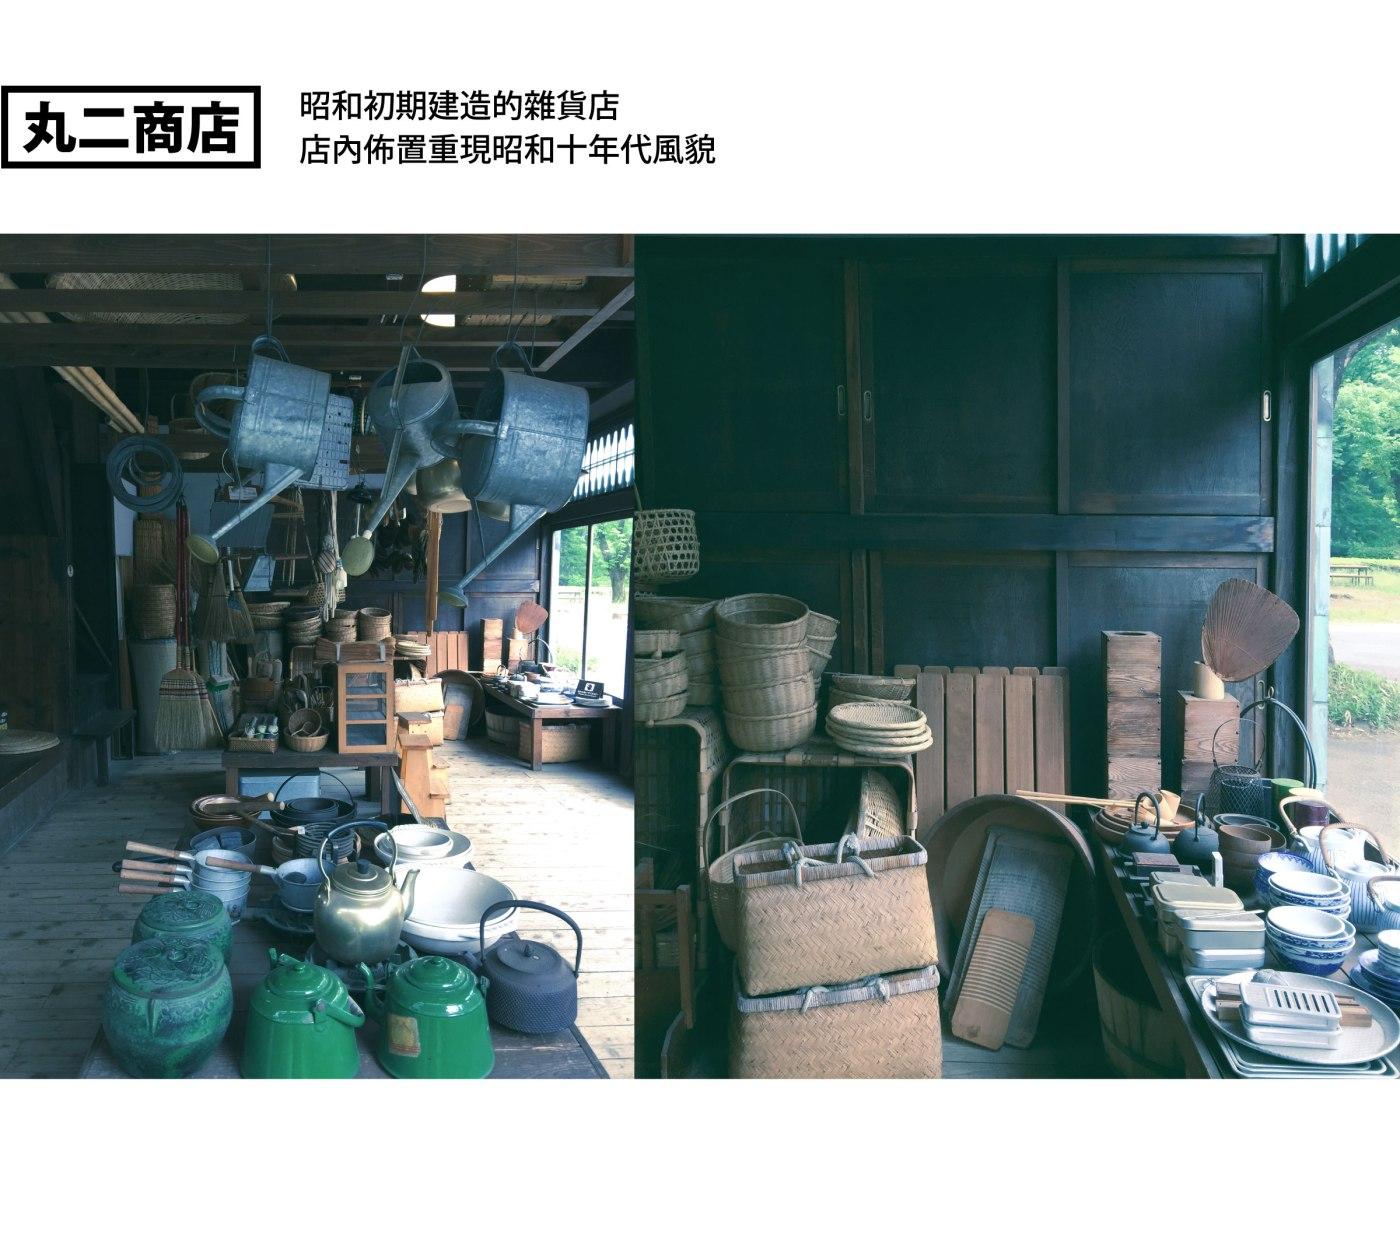 tokyo_topic-01-10